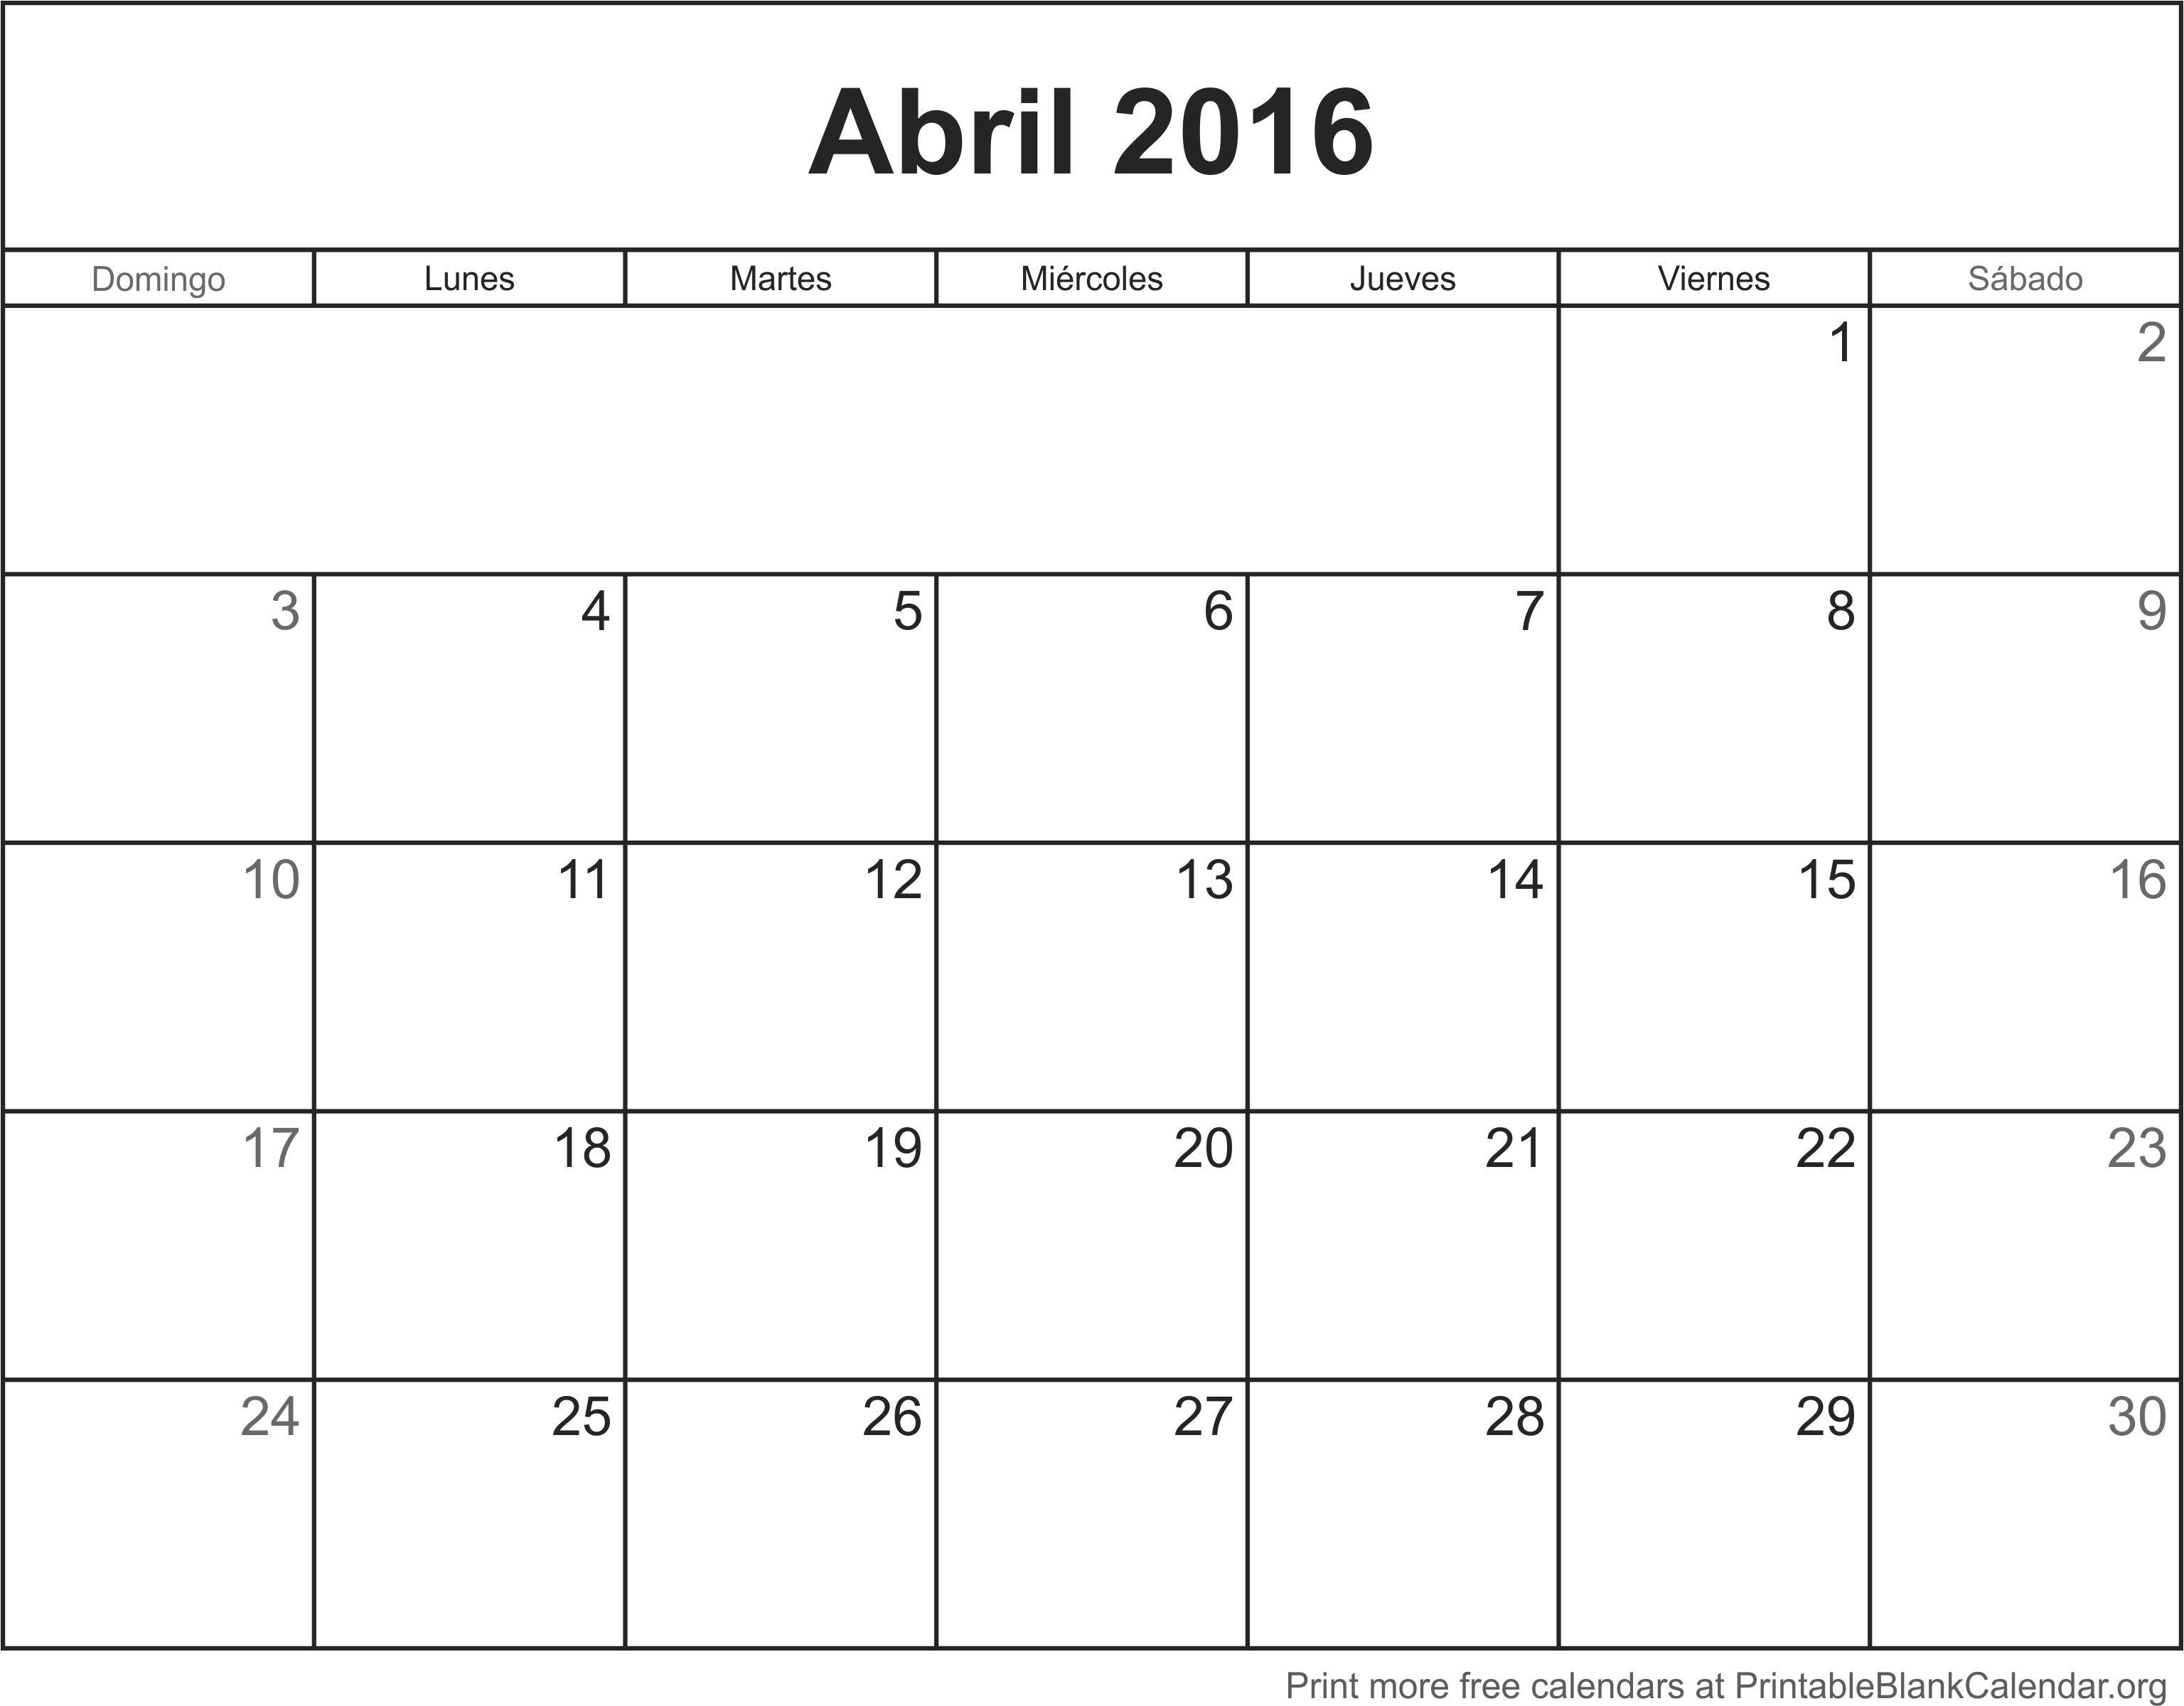 Abril 2016 Calendario para Imprimir - Calendarios Para Imprimir